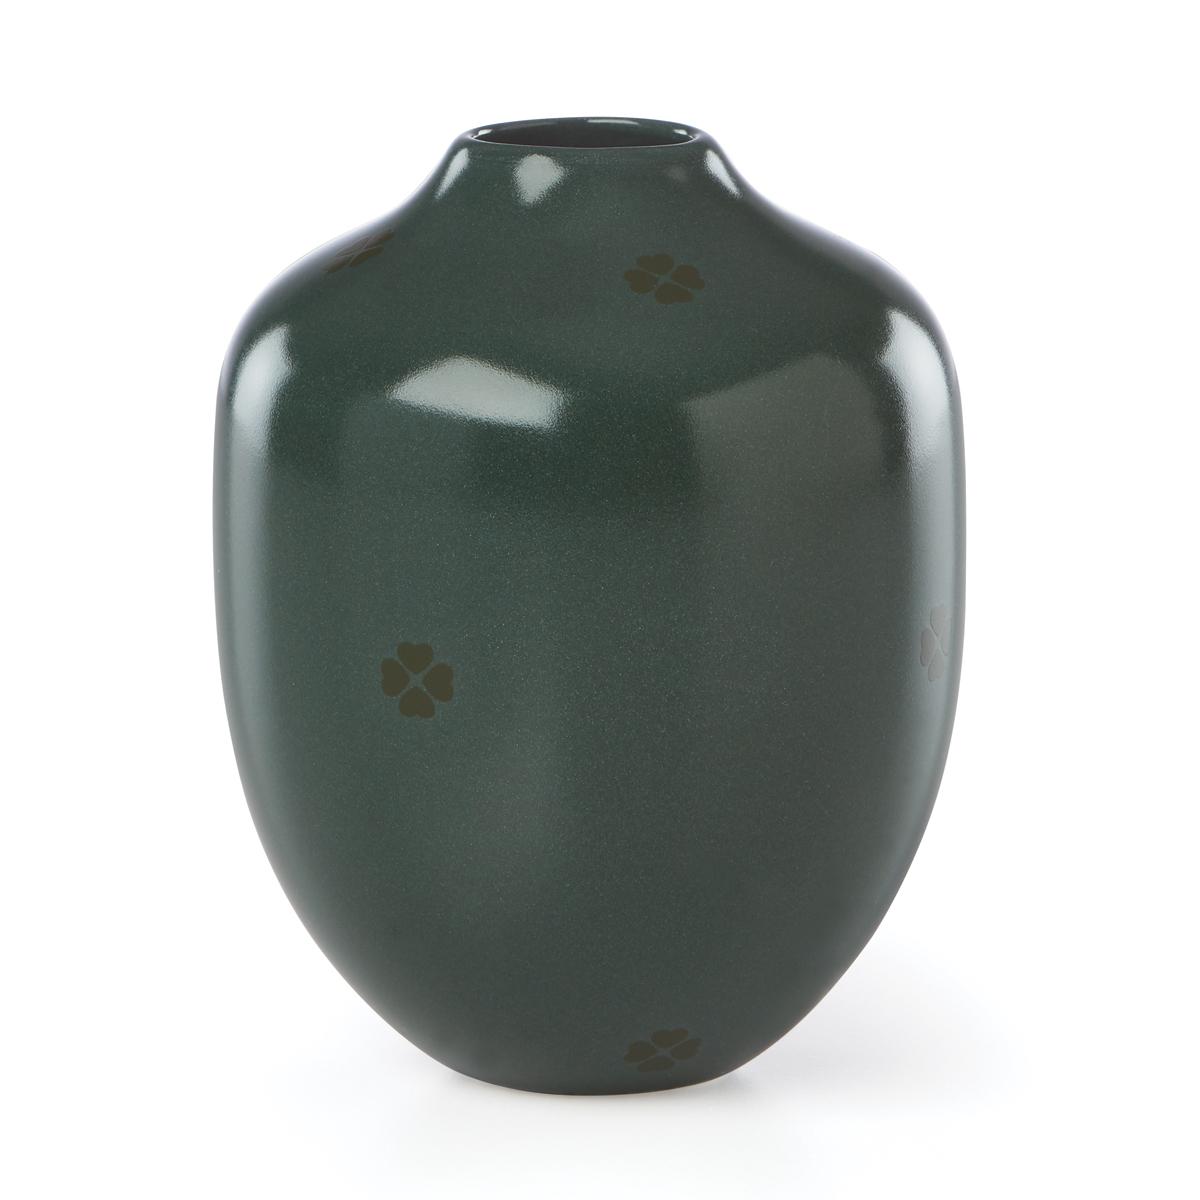 Kate Spade China by Lenox, Spade St Bud Vase Clover